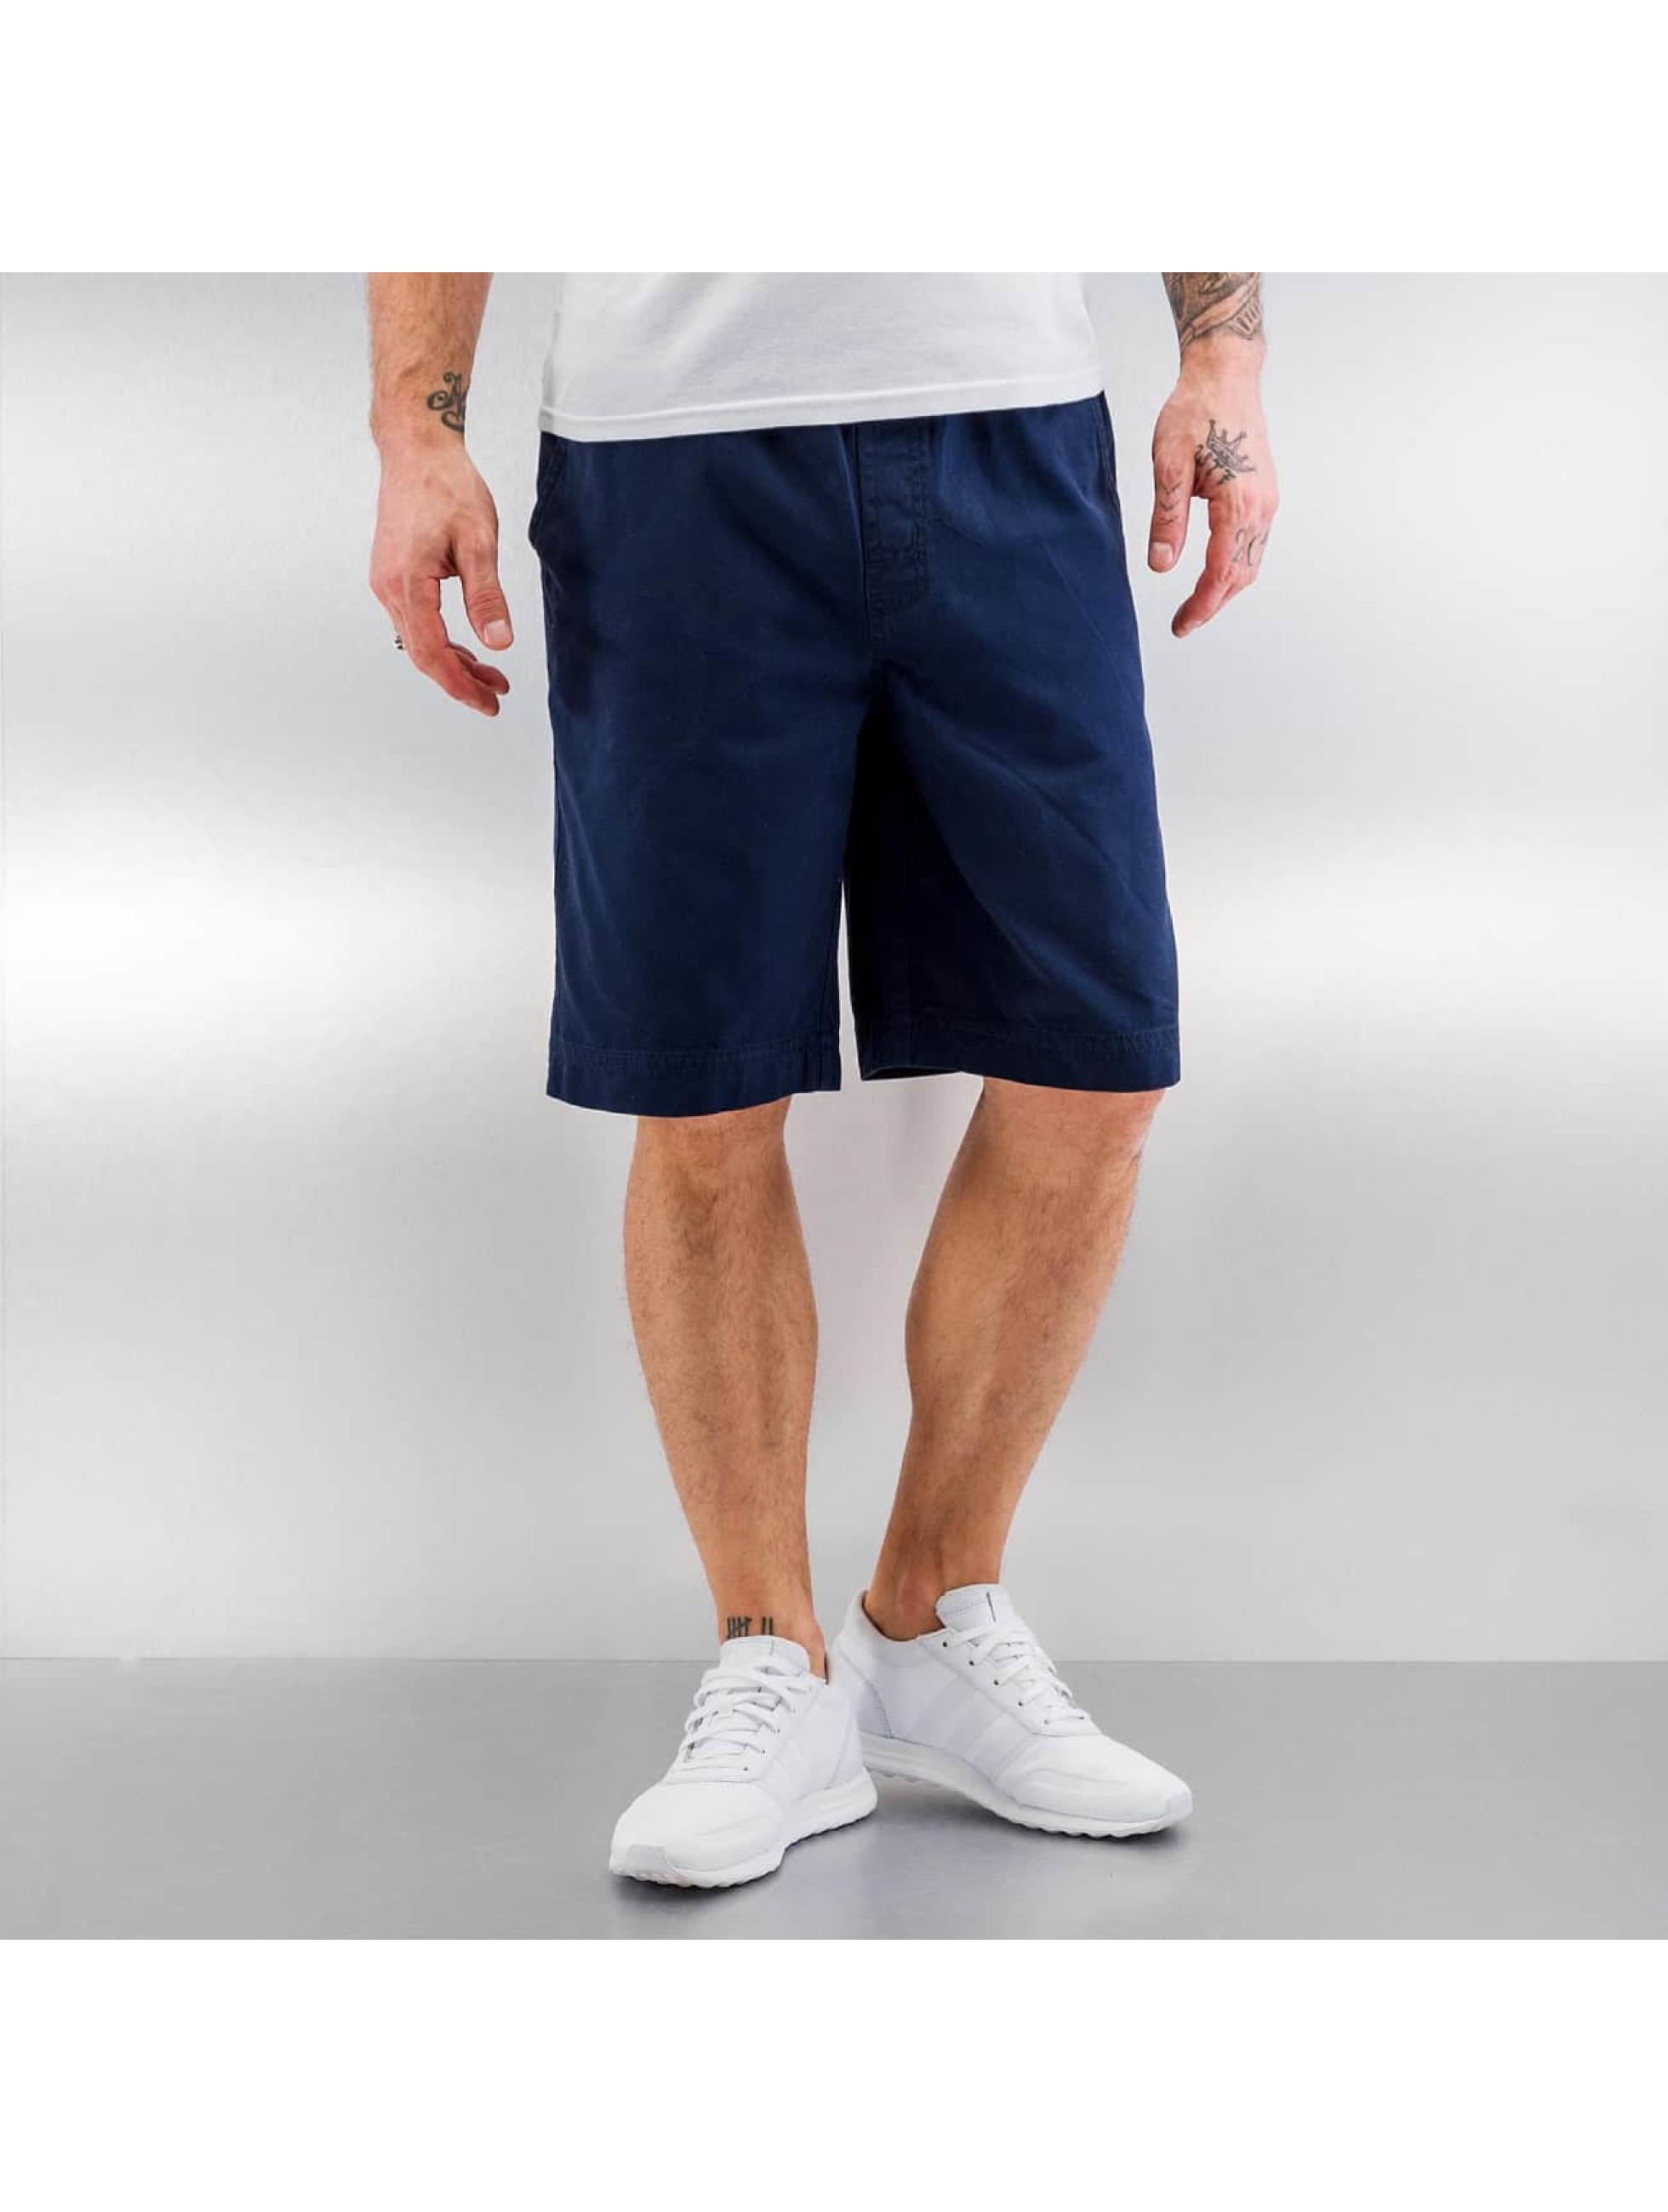 Amsterdenim Männer Shorts Bert in blau